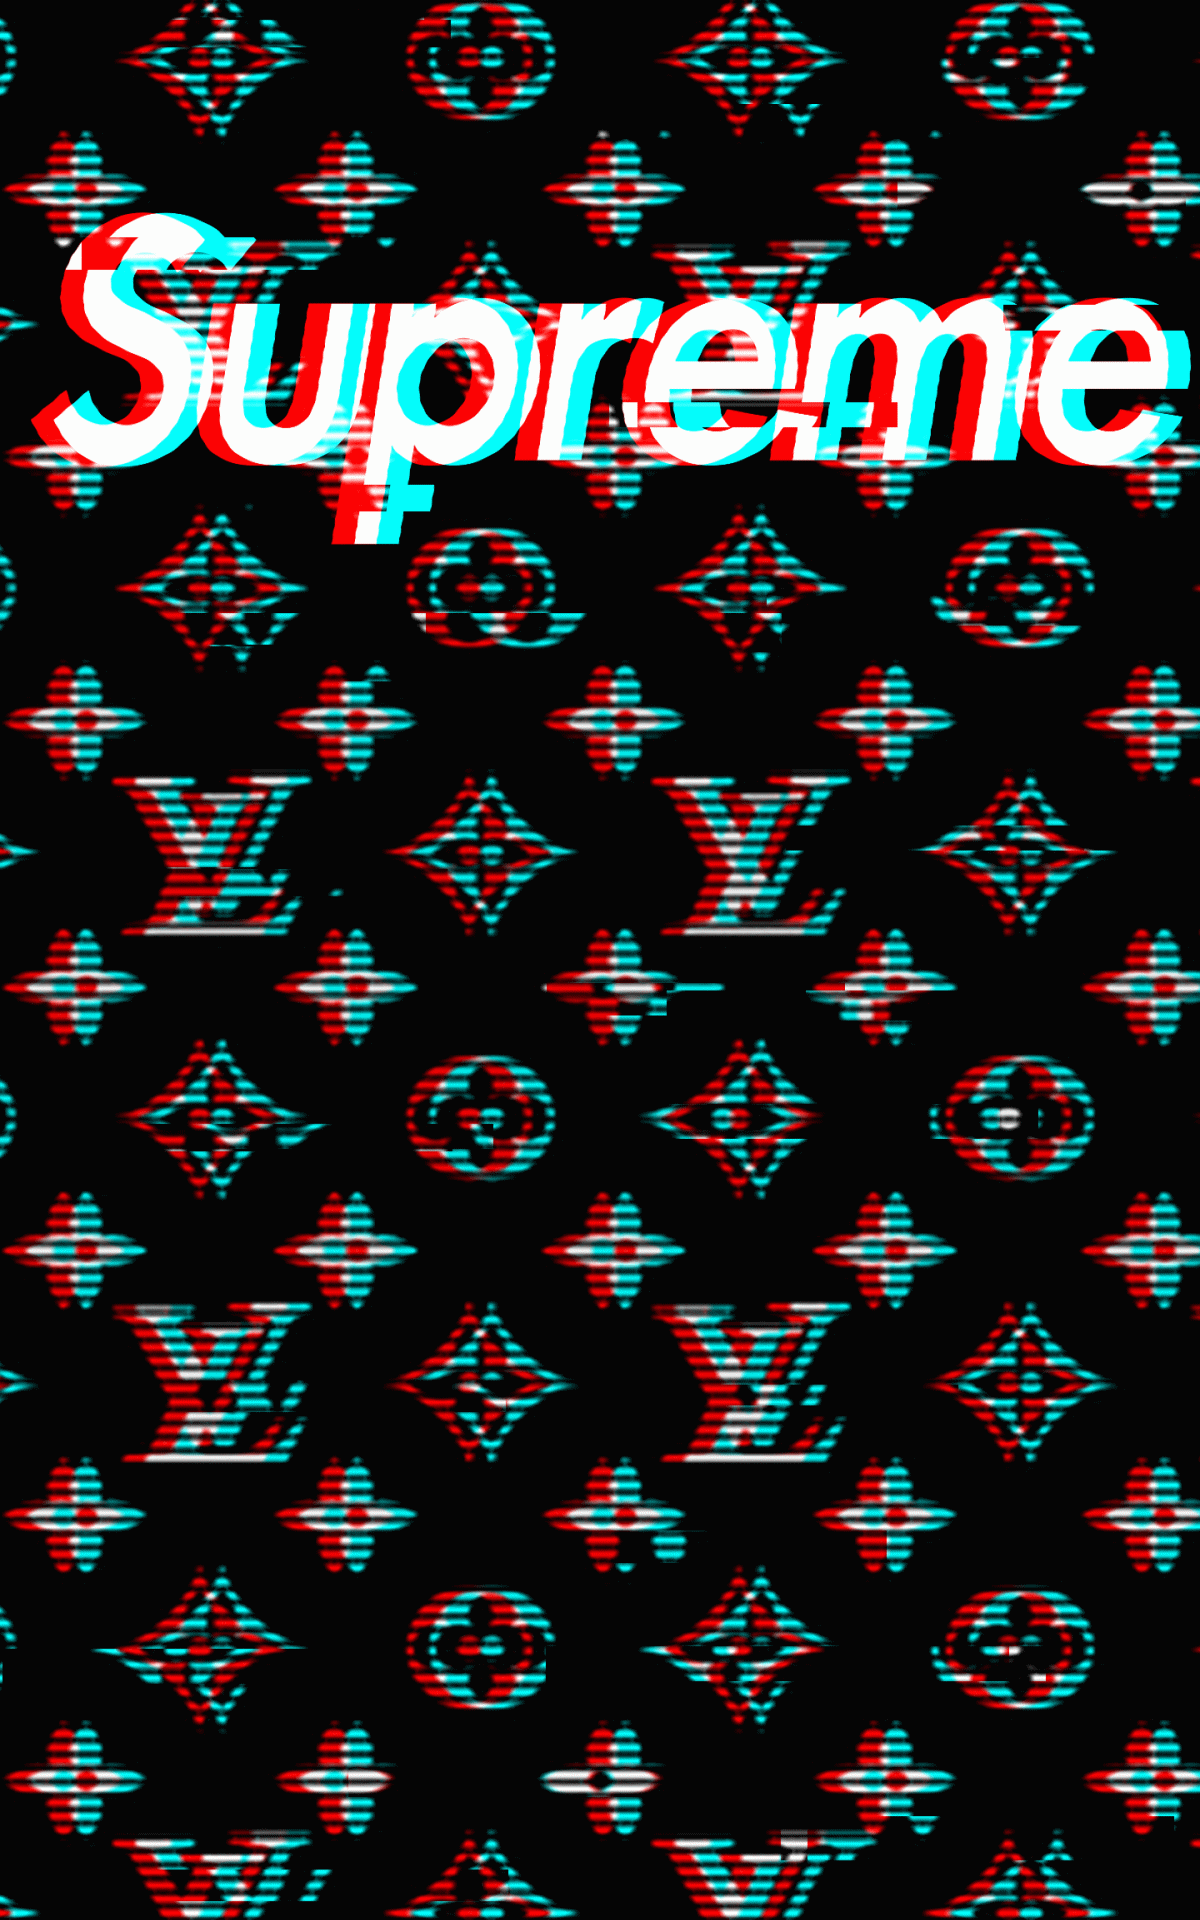 Louis Vuitton Supreme Wallpapers